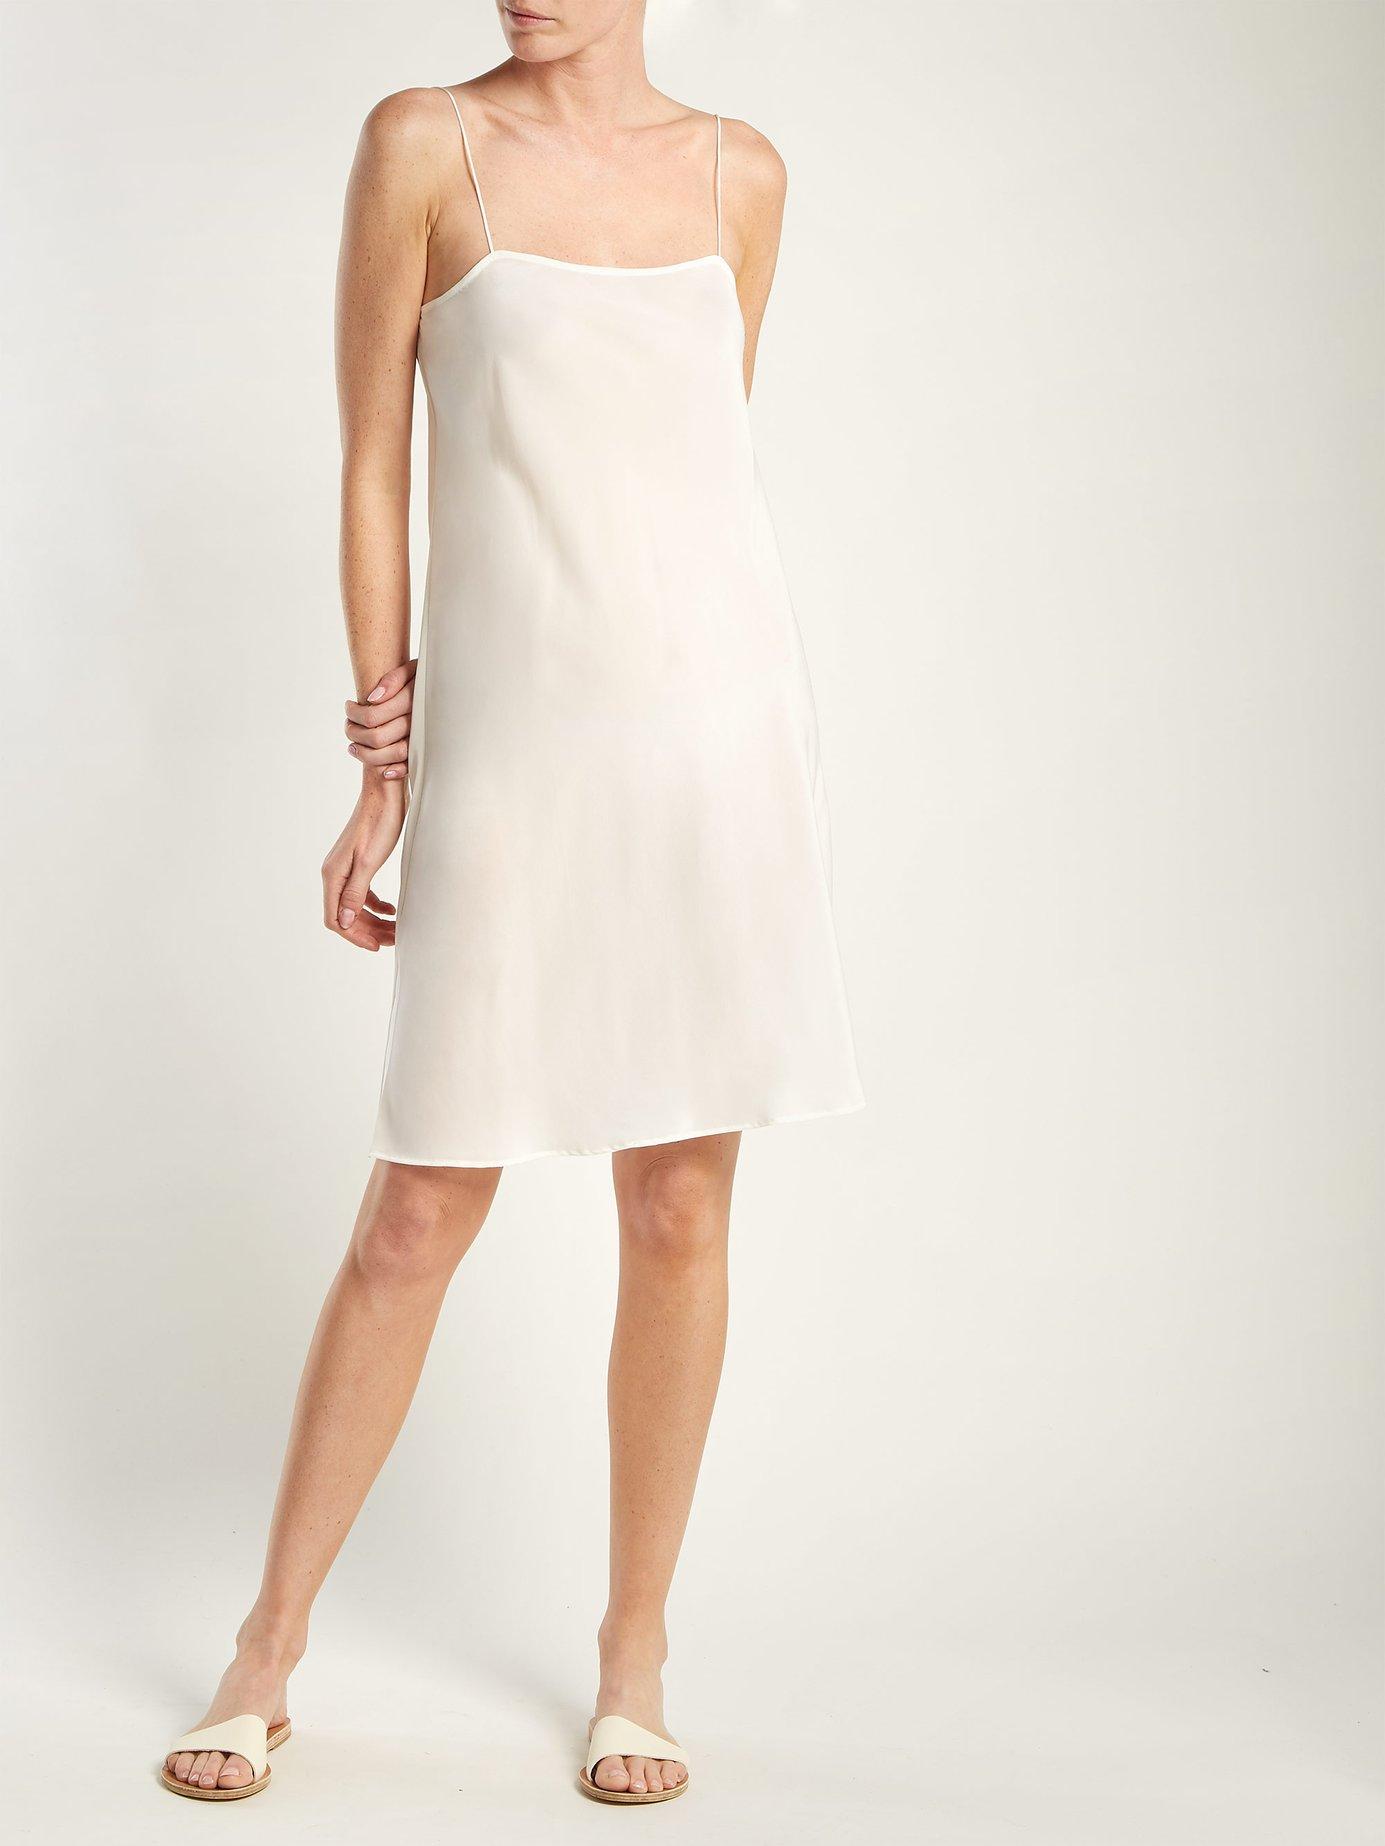 Bias-cut silk slip dress by Loup Charmant